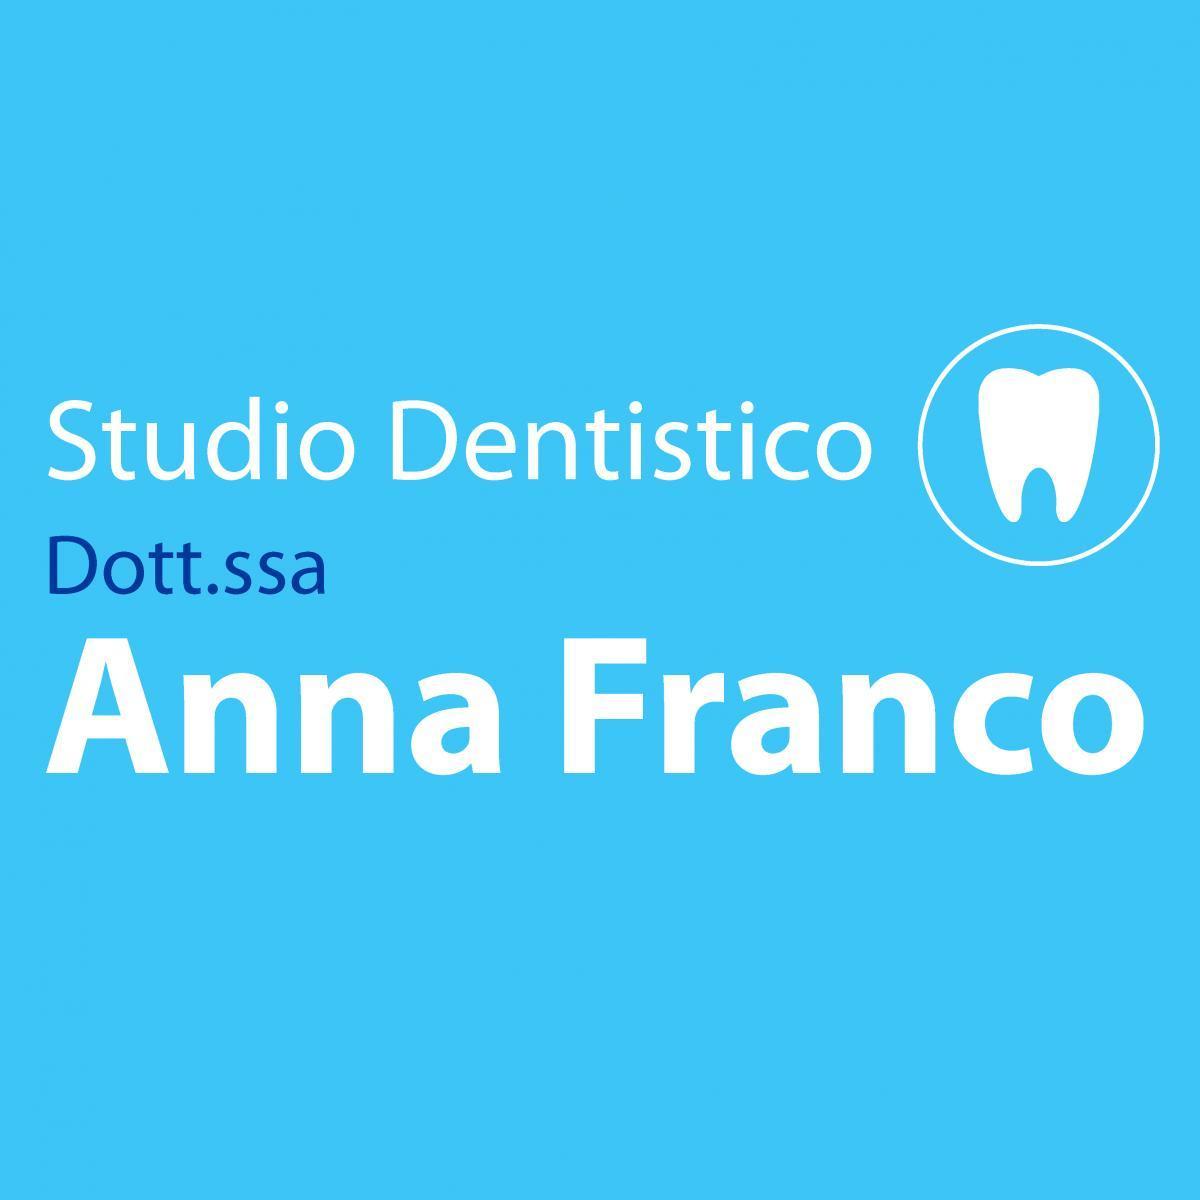 Studio Dentistico Dott.ssa Anna Franco